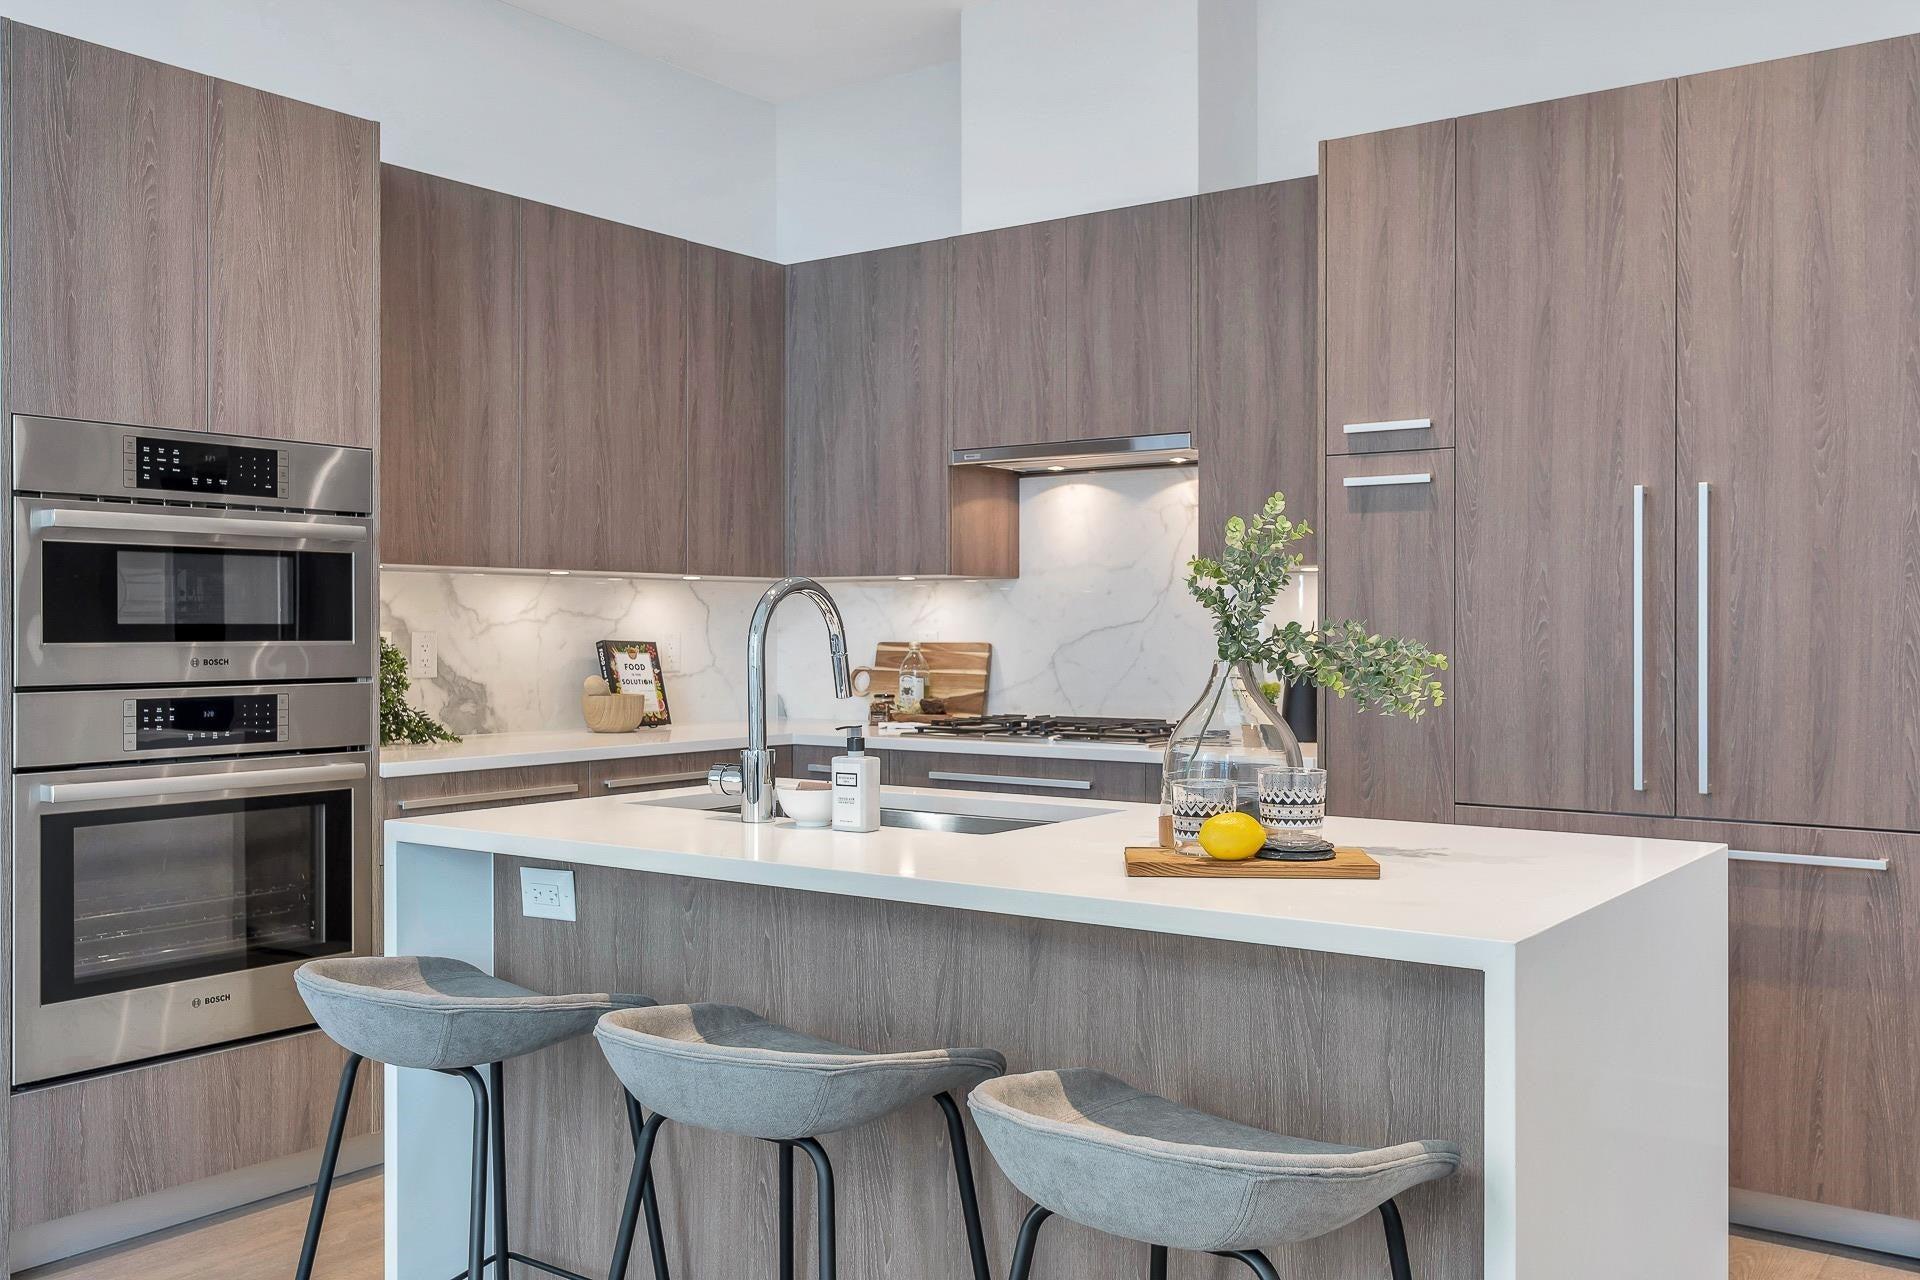 702 2780 VALLEY CENTRE AVENUE - Lynn Valley Apartment/Condo for sale, 3 Bedrooms (R2622279) - #8